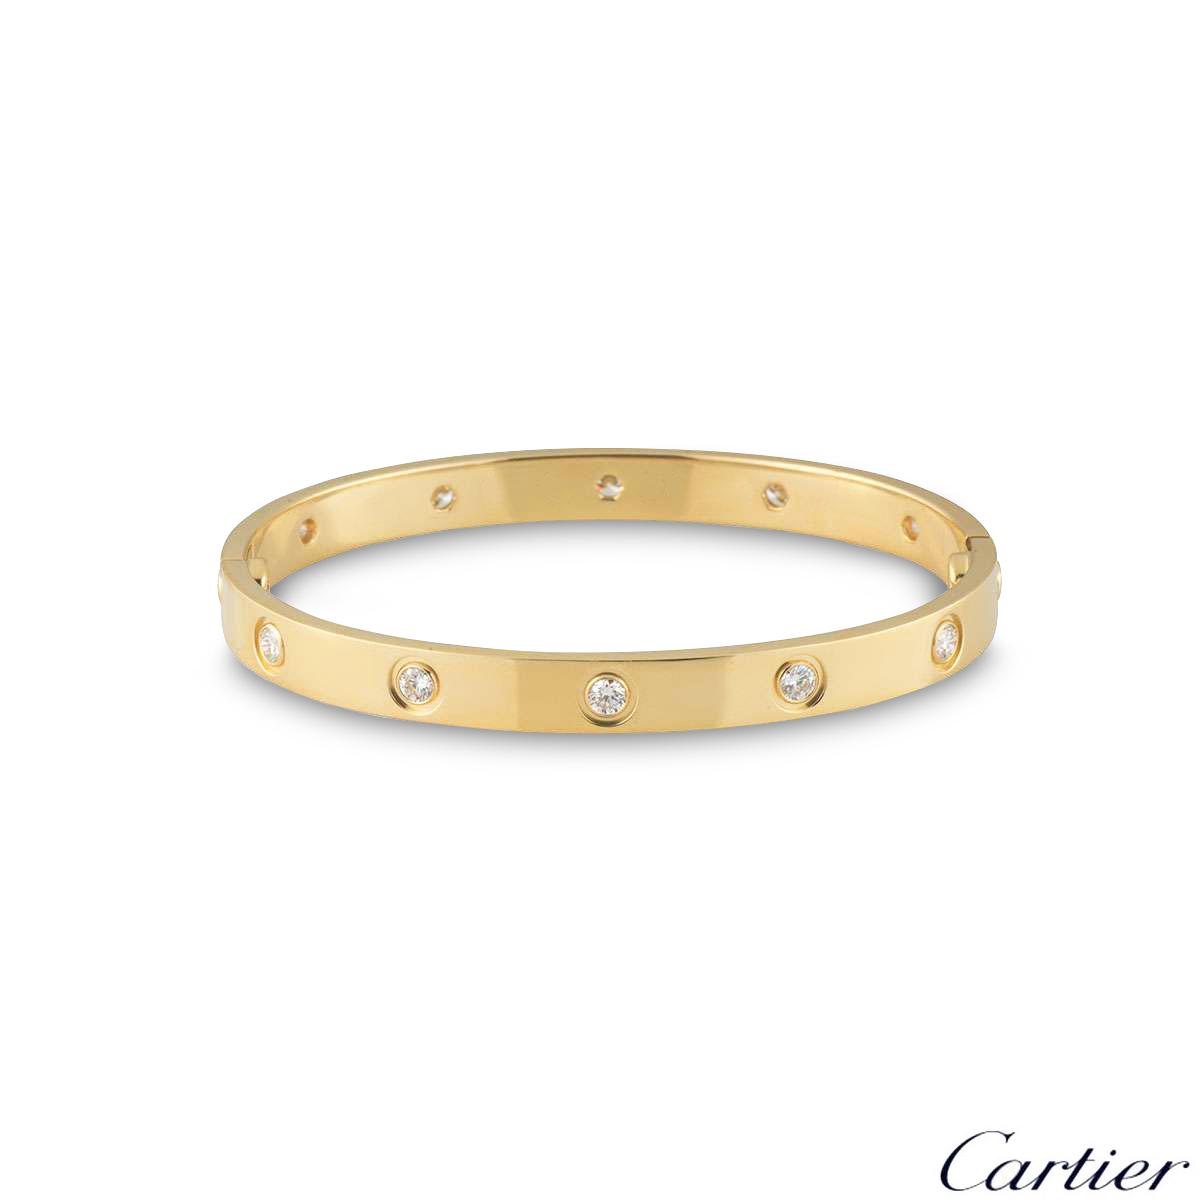 Cartier Yellow Gold Full Diamond Love Bracelet Size 18 B6040518